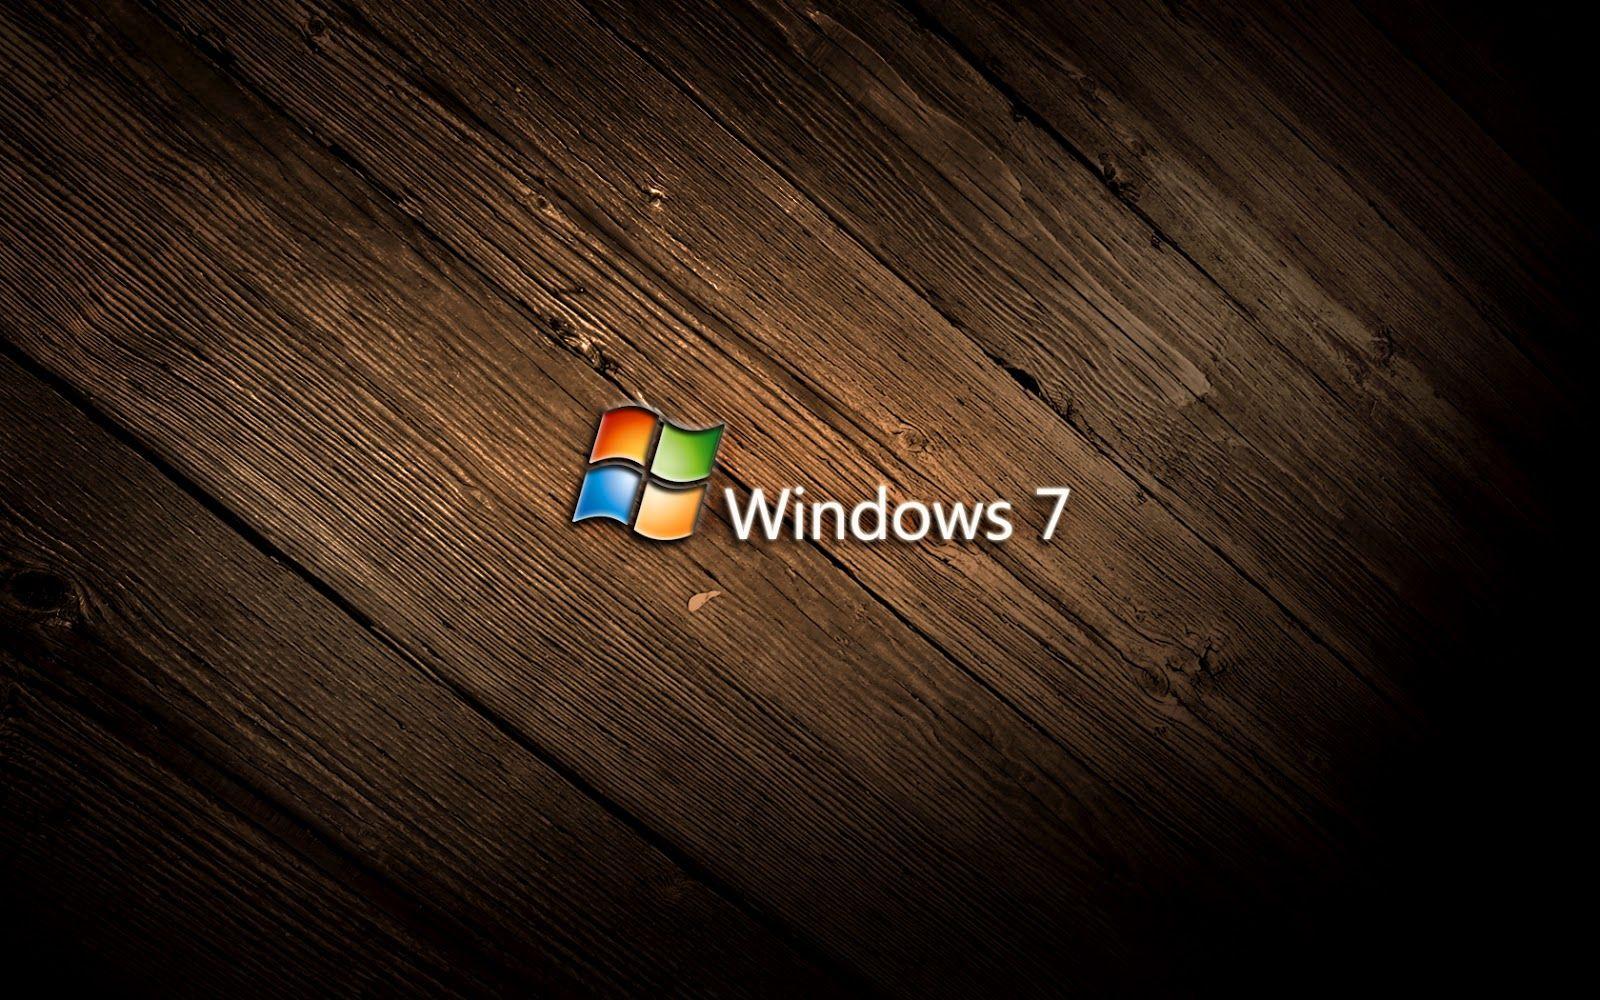 Taustakuva ikkunoihin 7 Wallpaperforwindows71720x450